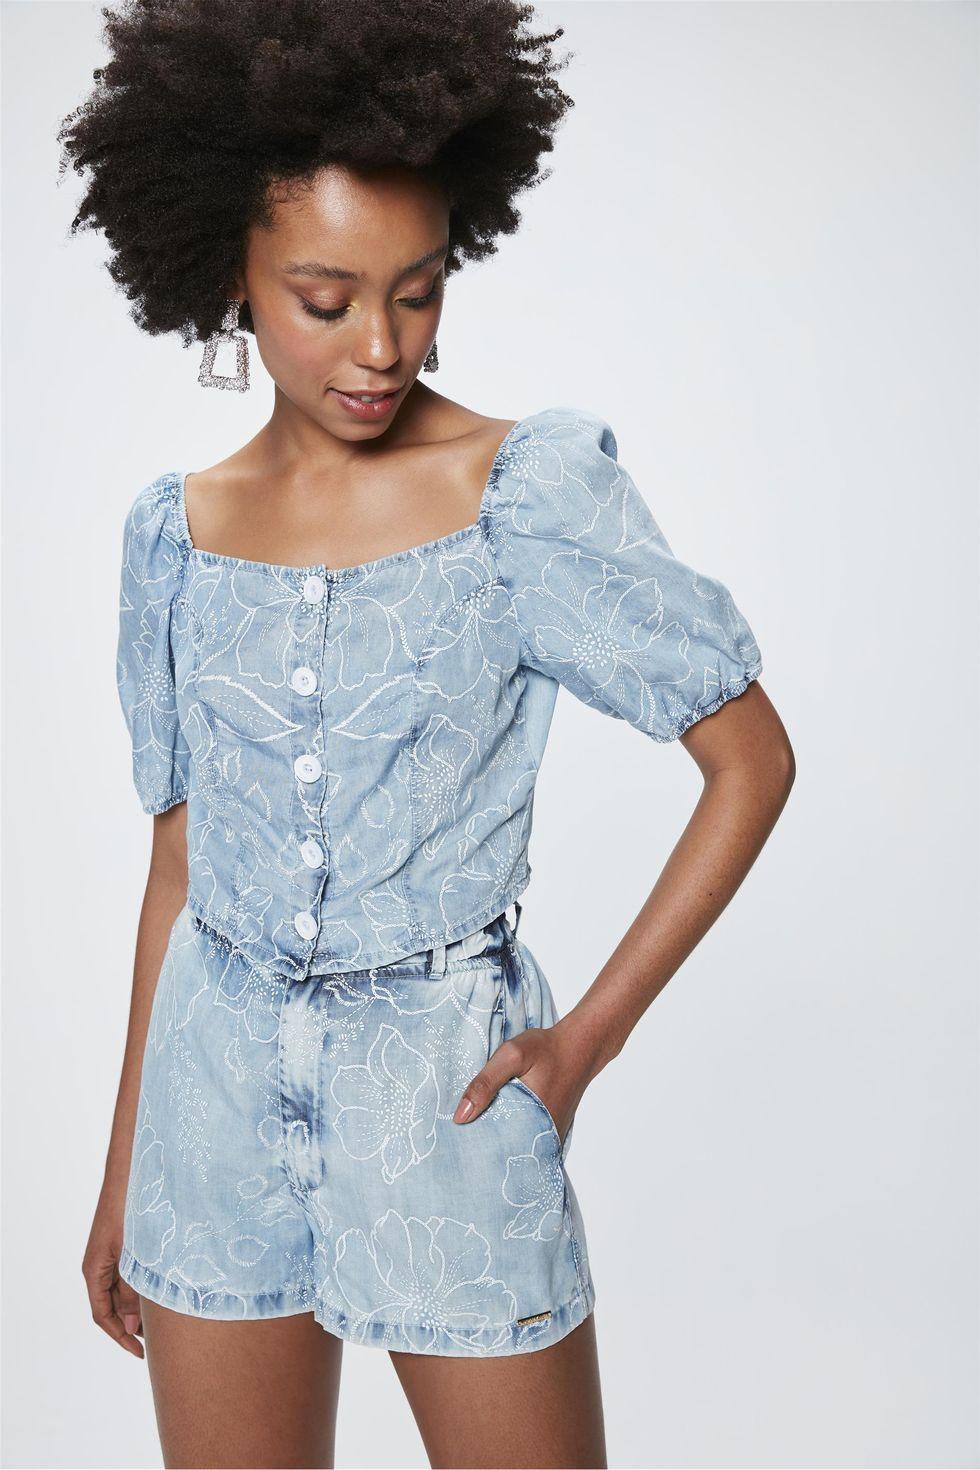 Top-Cropped-Jeans-com-Estampa-Floral-Frente--